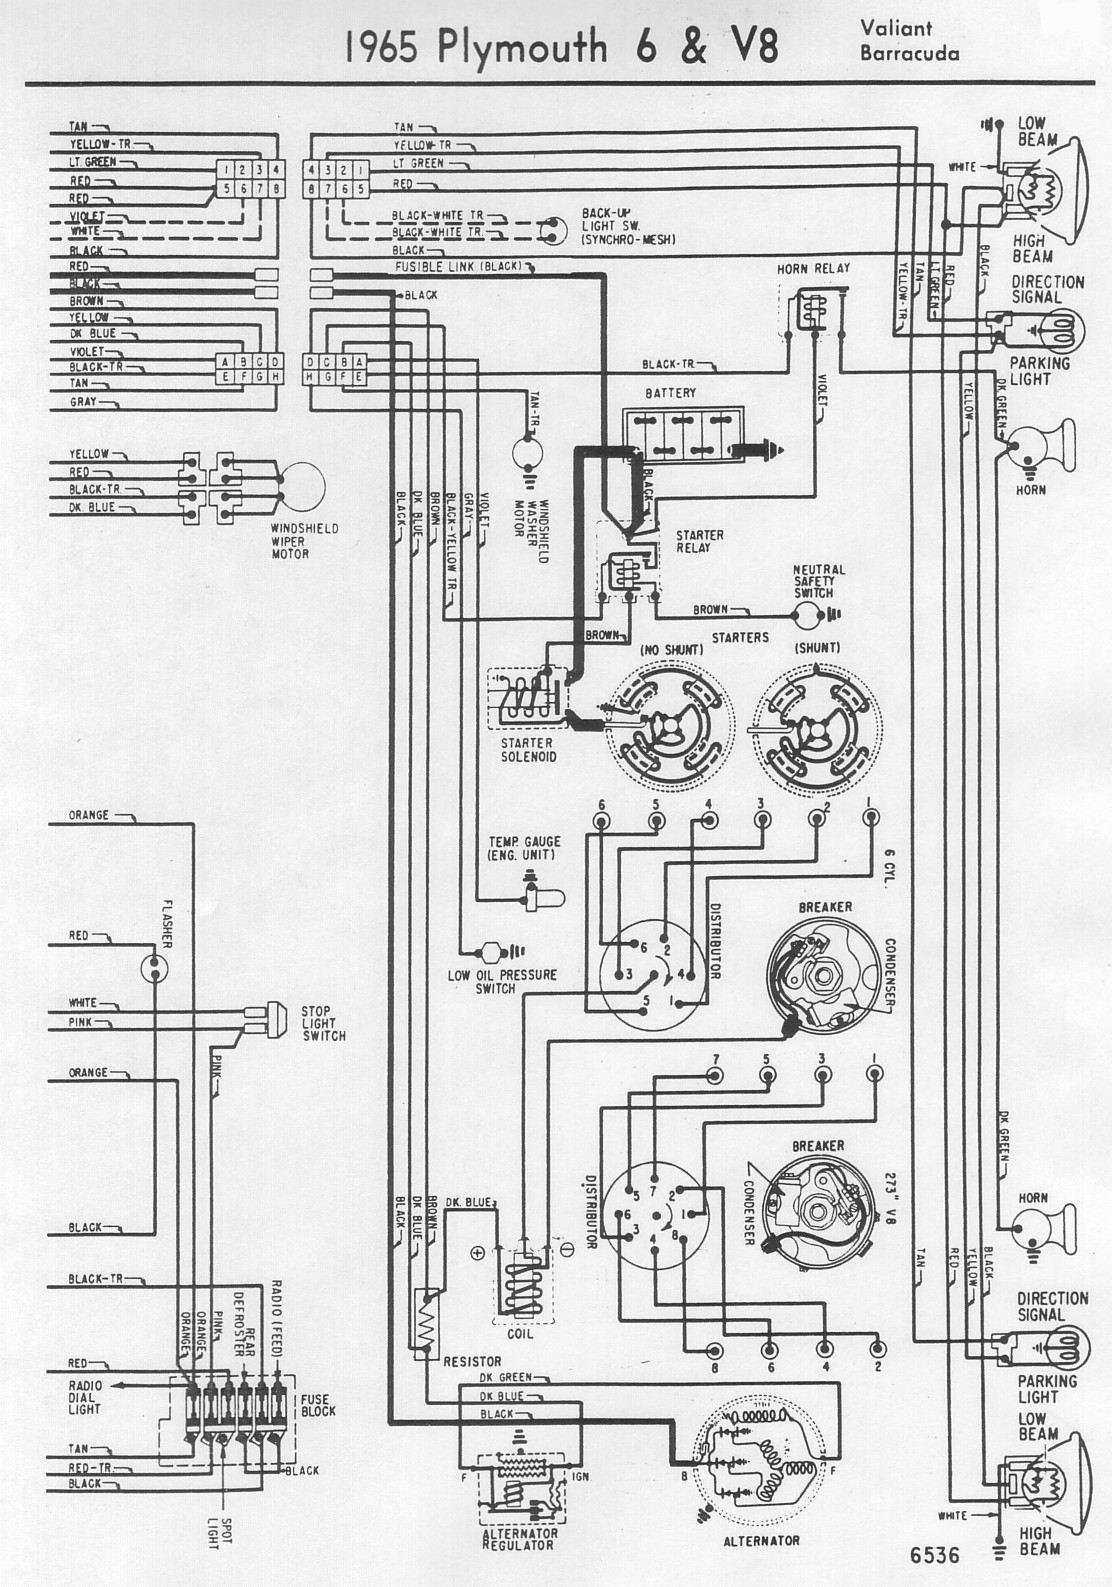 hight resolution of 1972 cuda wiper diagram trusted wiring diagram windshield wiper motor wiring diagram 1972 cuda wiper diagram wiring schematic